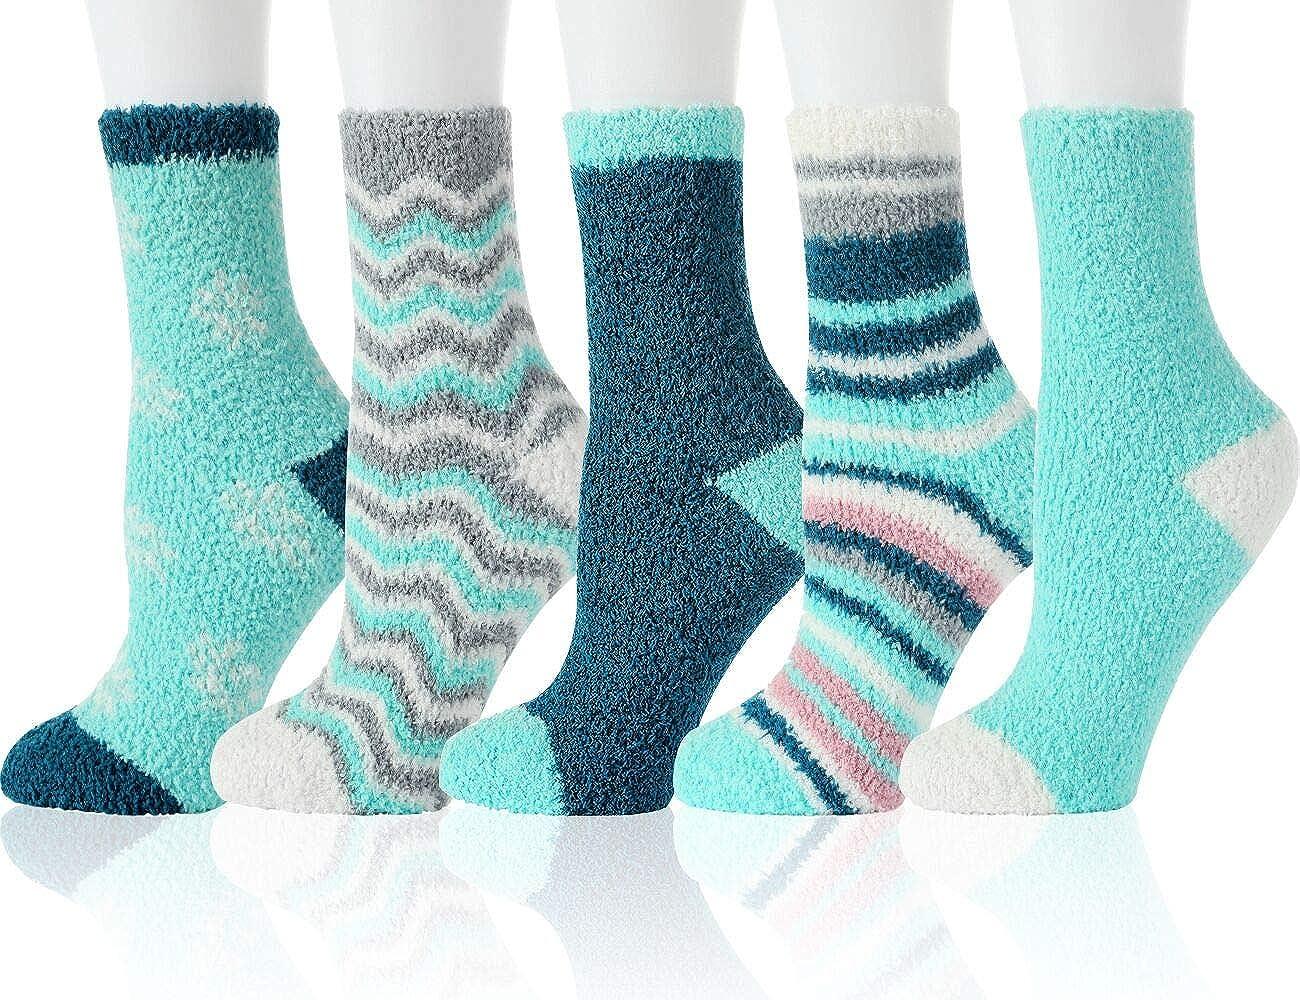 Fuzzy Cozy Socks Women Fluffy Plush Crew Slipper Sock For Girls Warm for Winter 5-6 Pairs